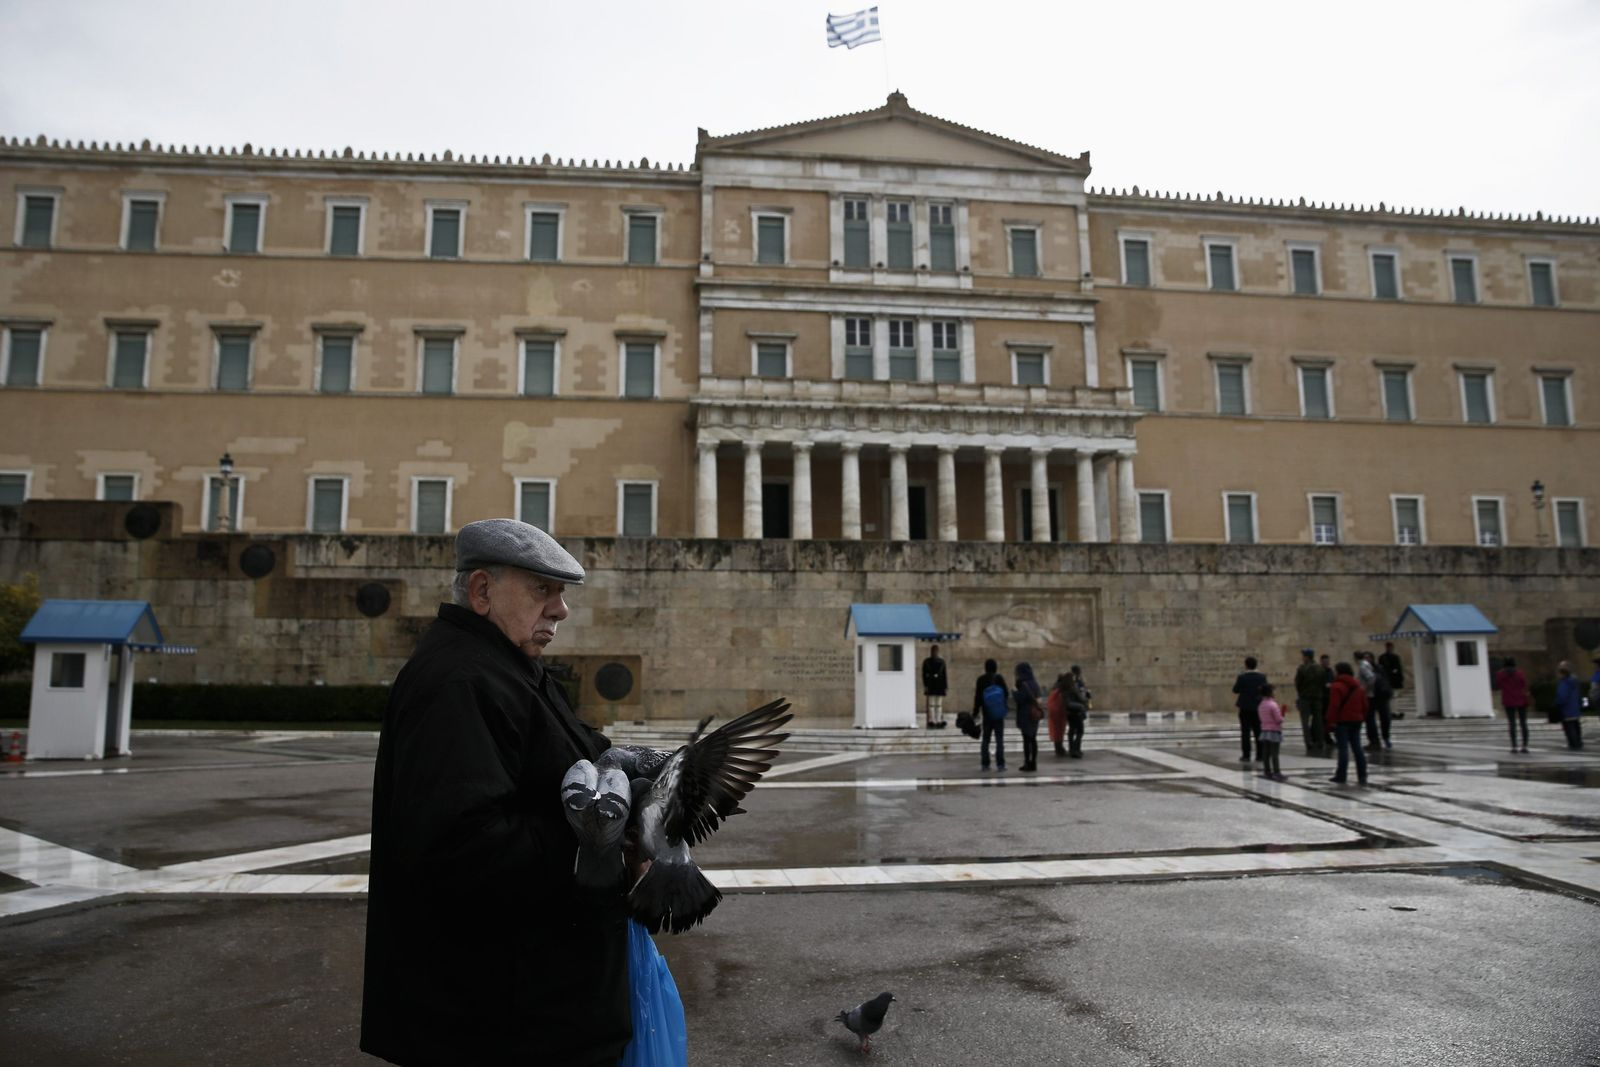 Athen / Griechenland / Parlament